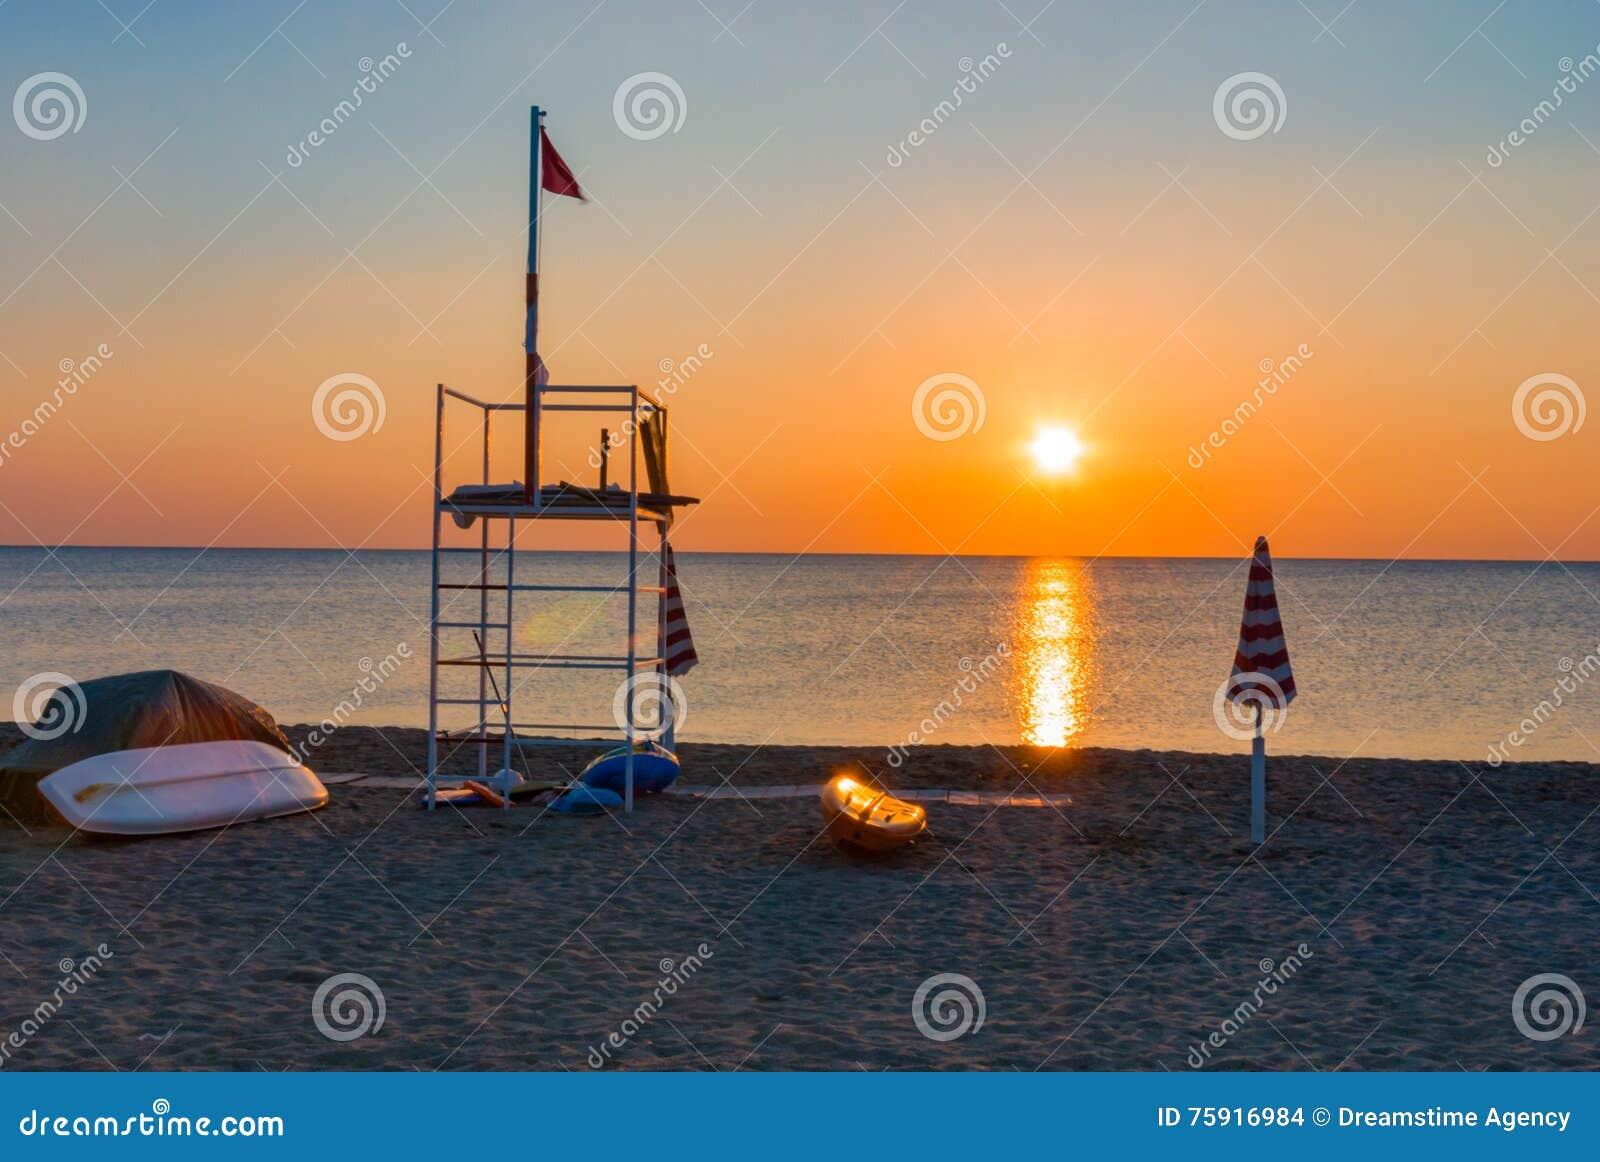 Lifeguard tower beach sunset sunrise parasol boat